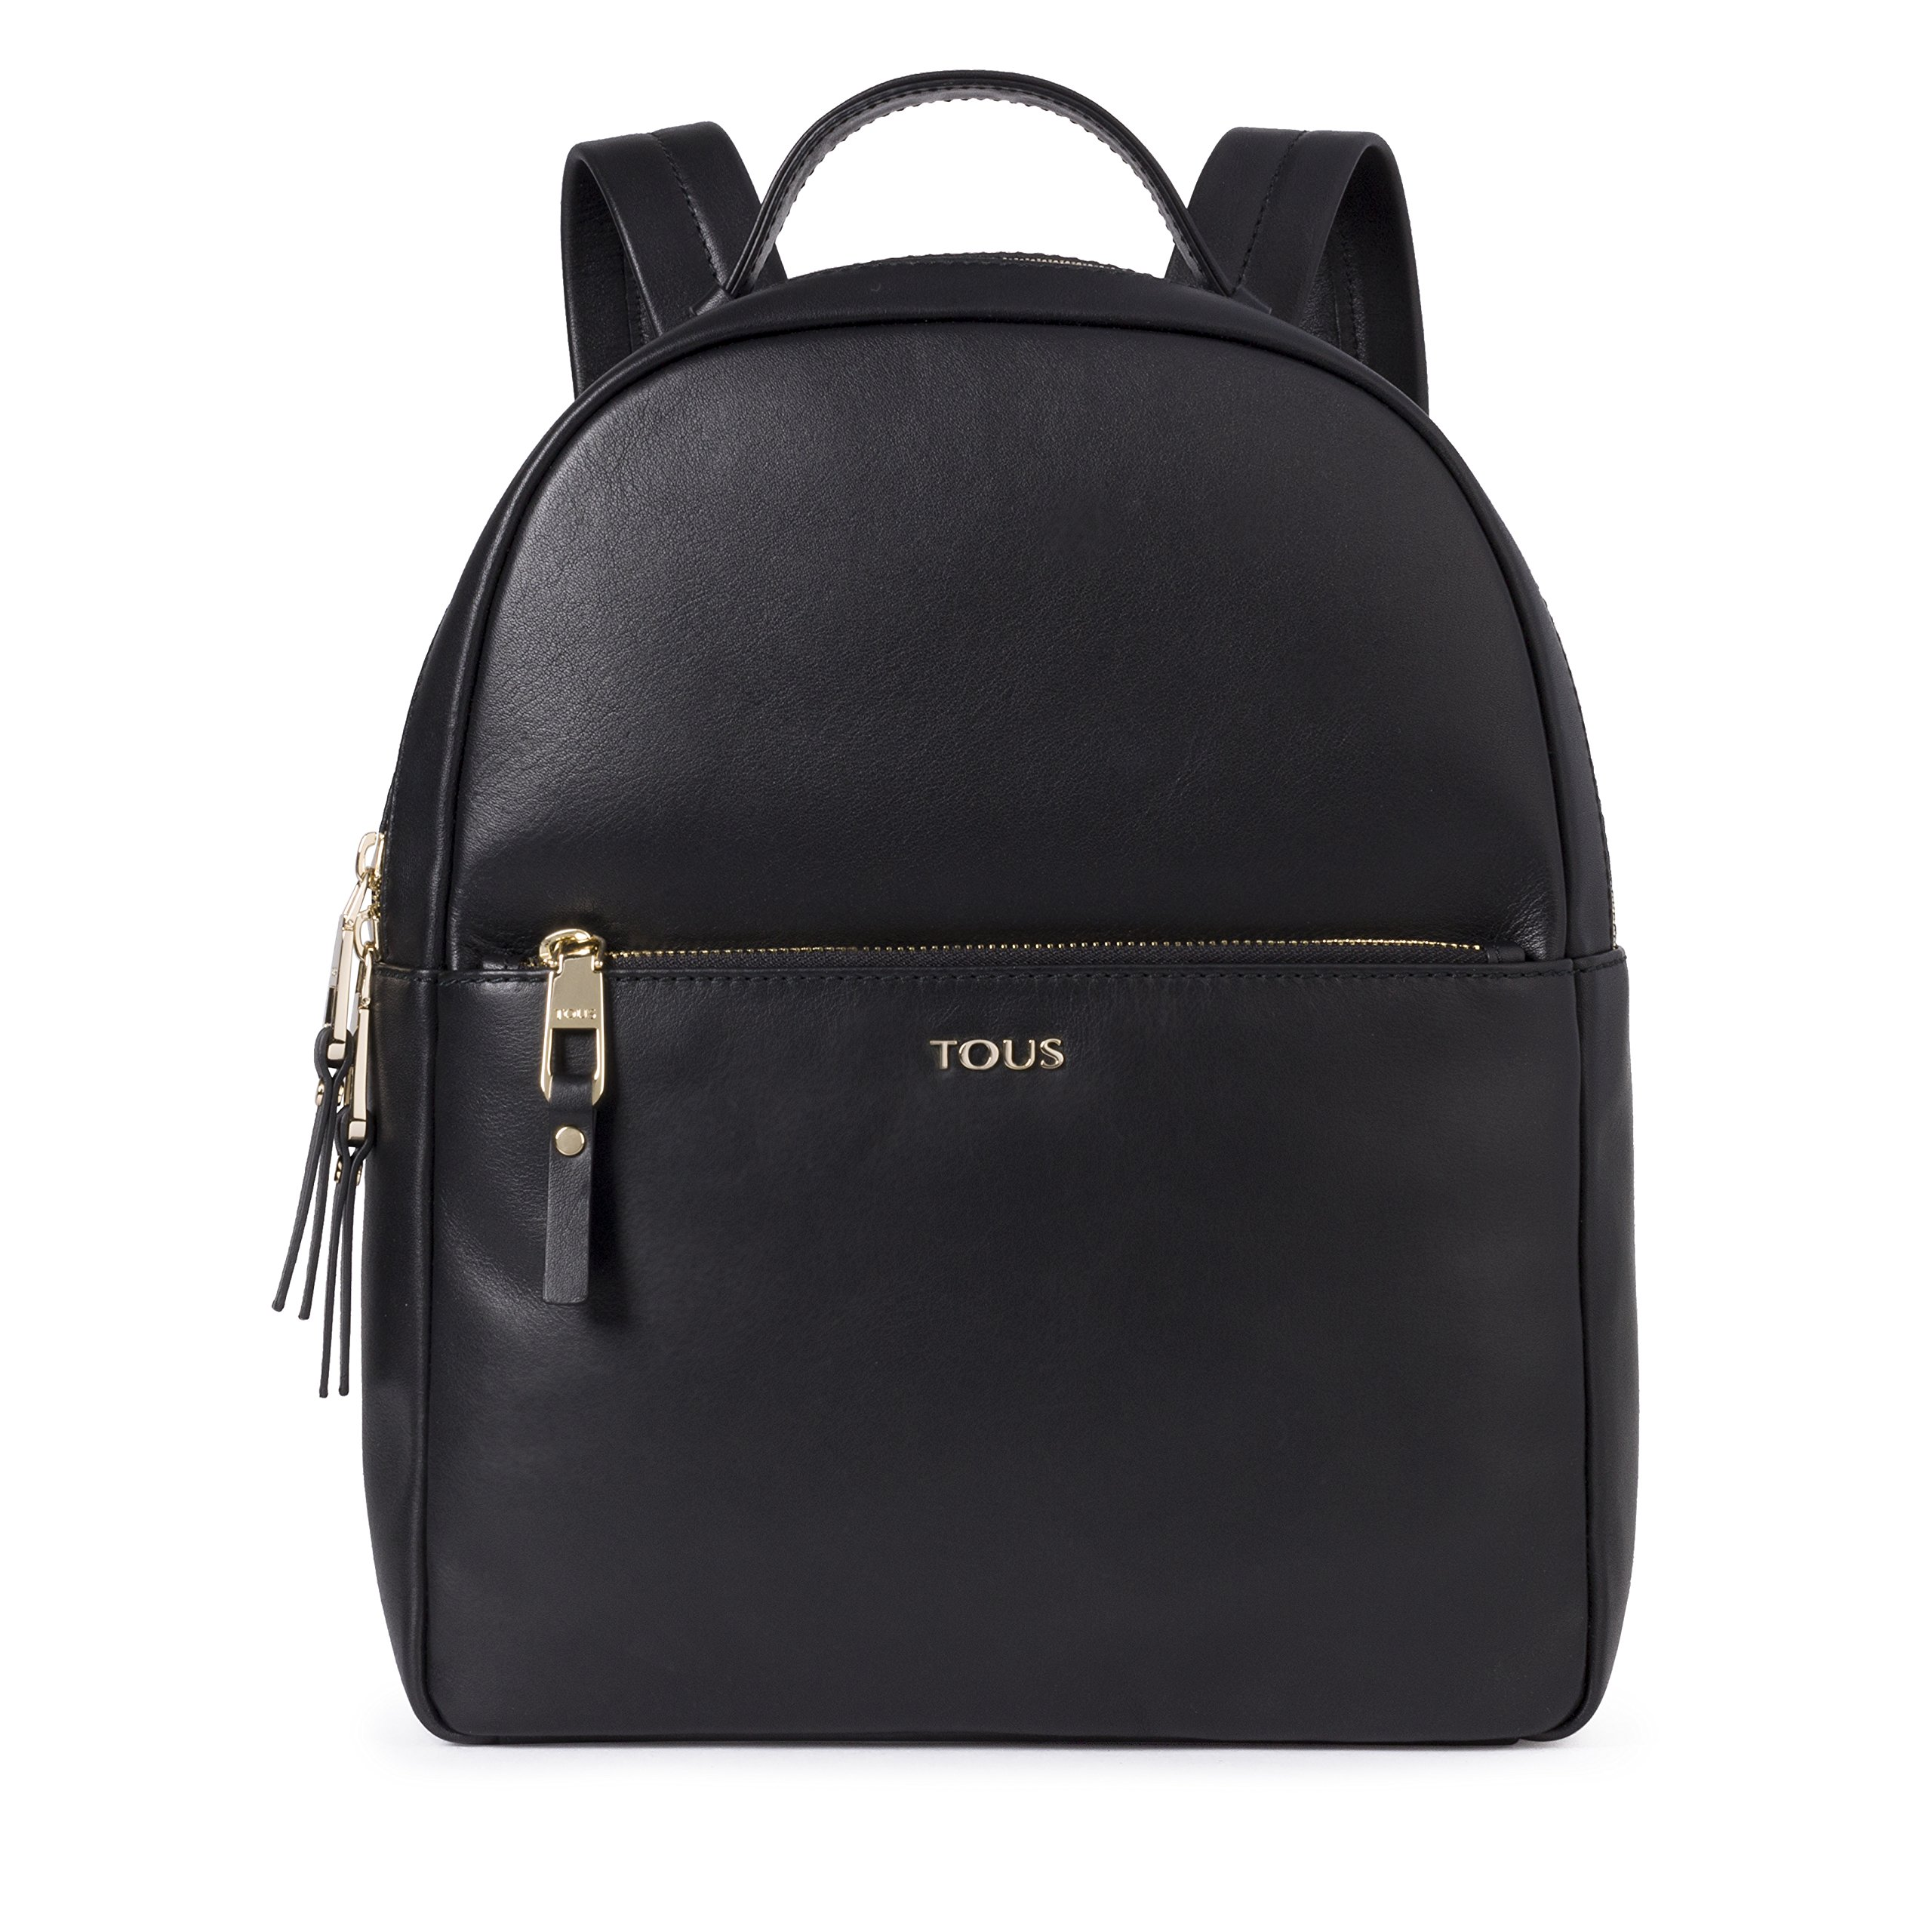 915sC2UechL - Tous Higgins, Bolso mochila para Mujer, Negro (Negro 695890197), 27.5x33x11.5 cm (W x H x L)